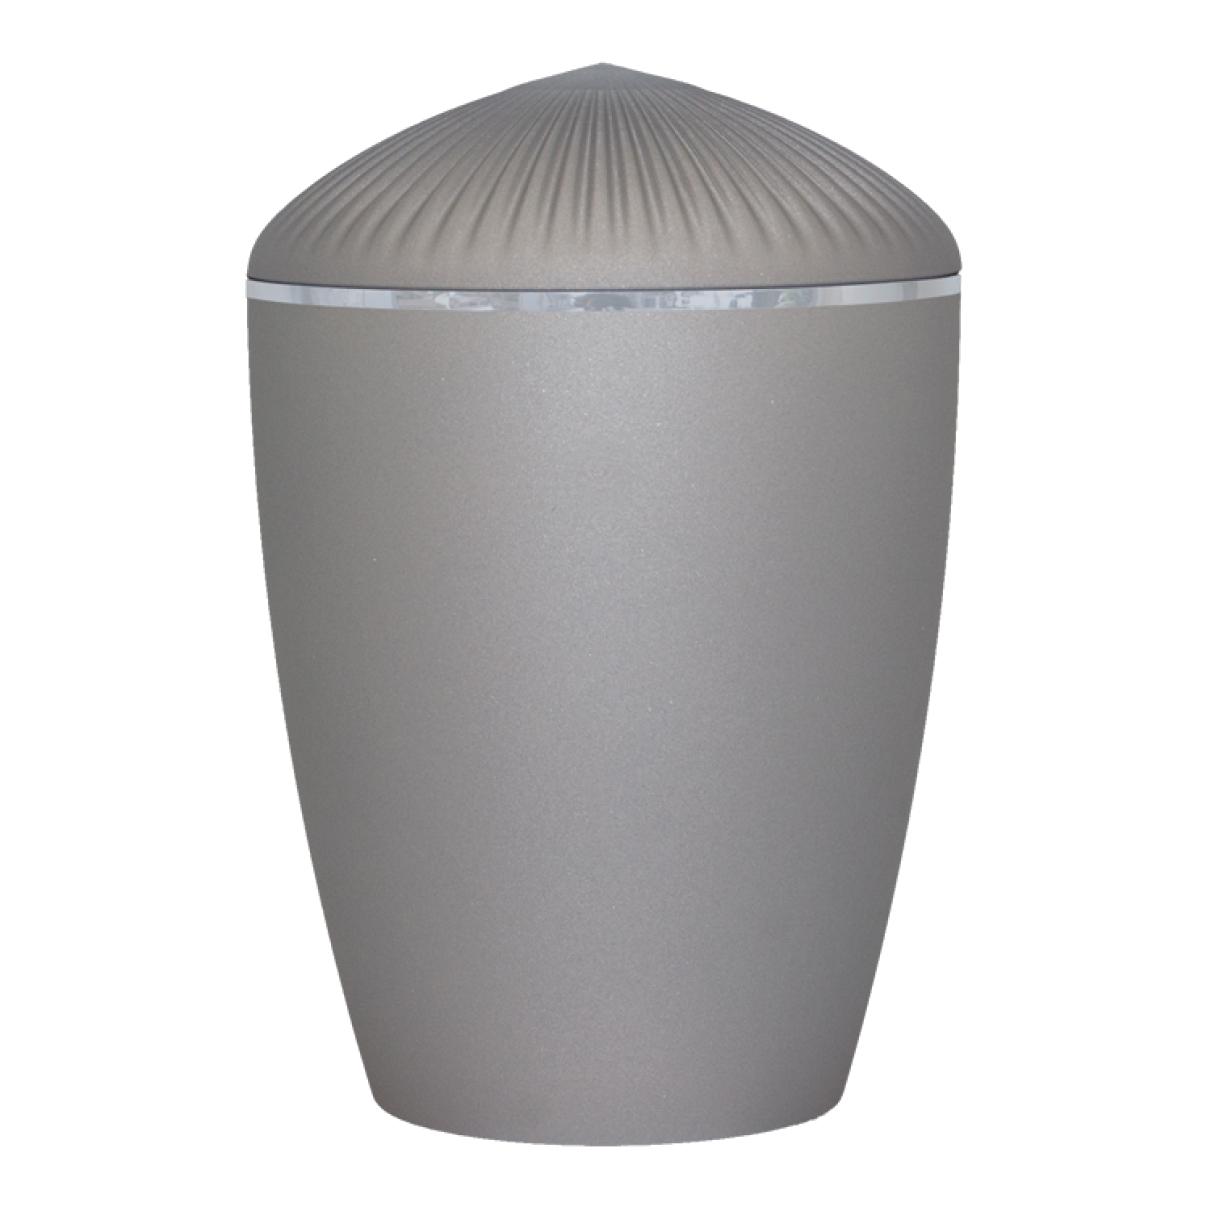 Ferndown Silver Band Cremation Urn – Velvet Grey